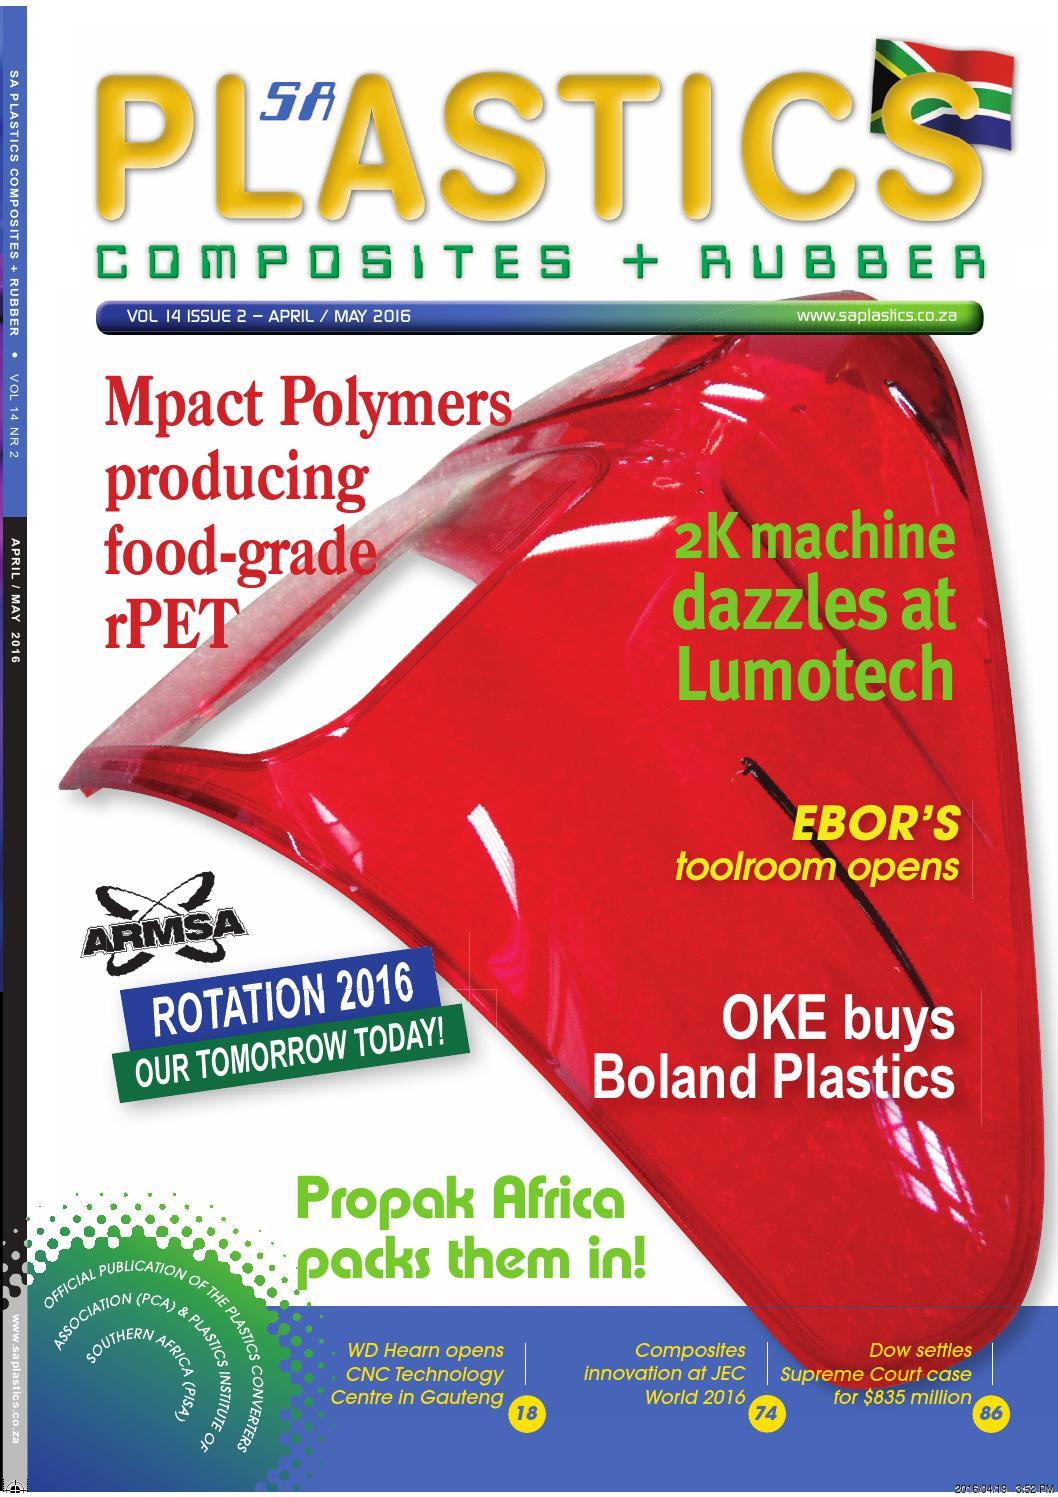 SA Plastics - April/May 2016 by SA Plastics, Composites